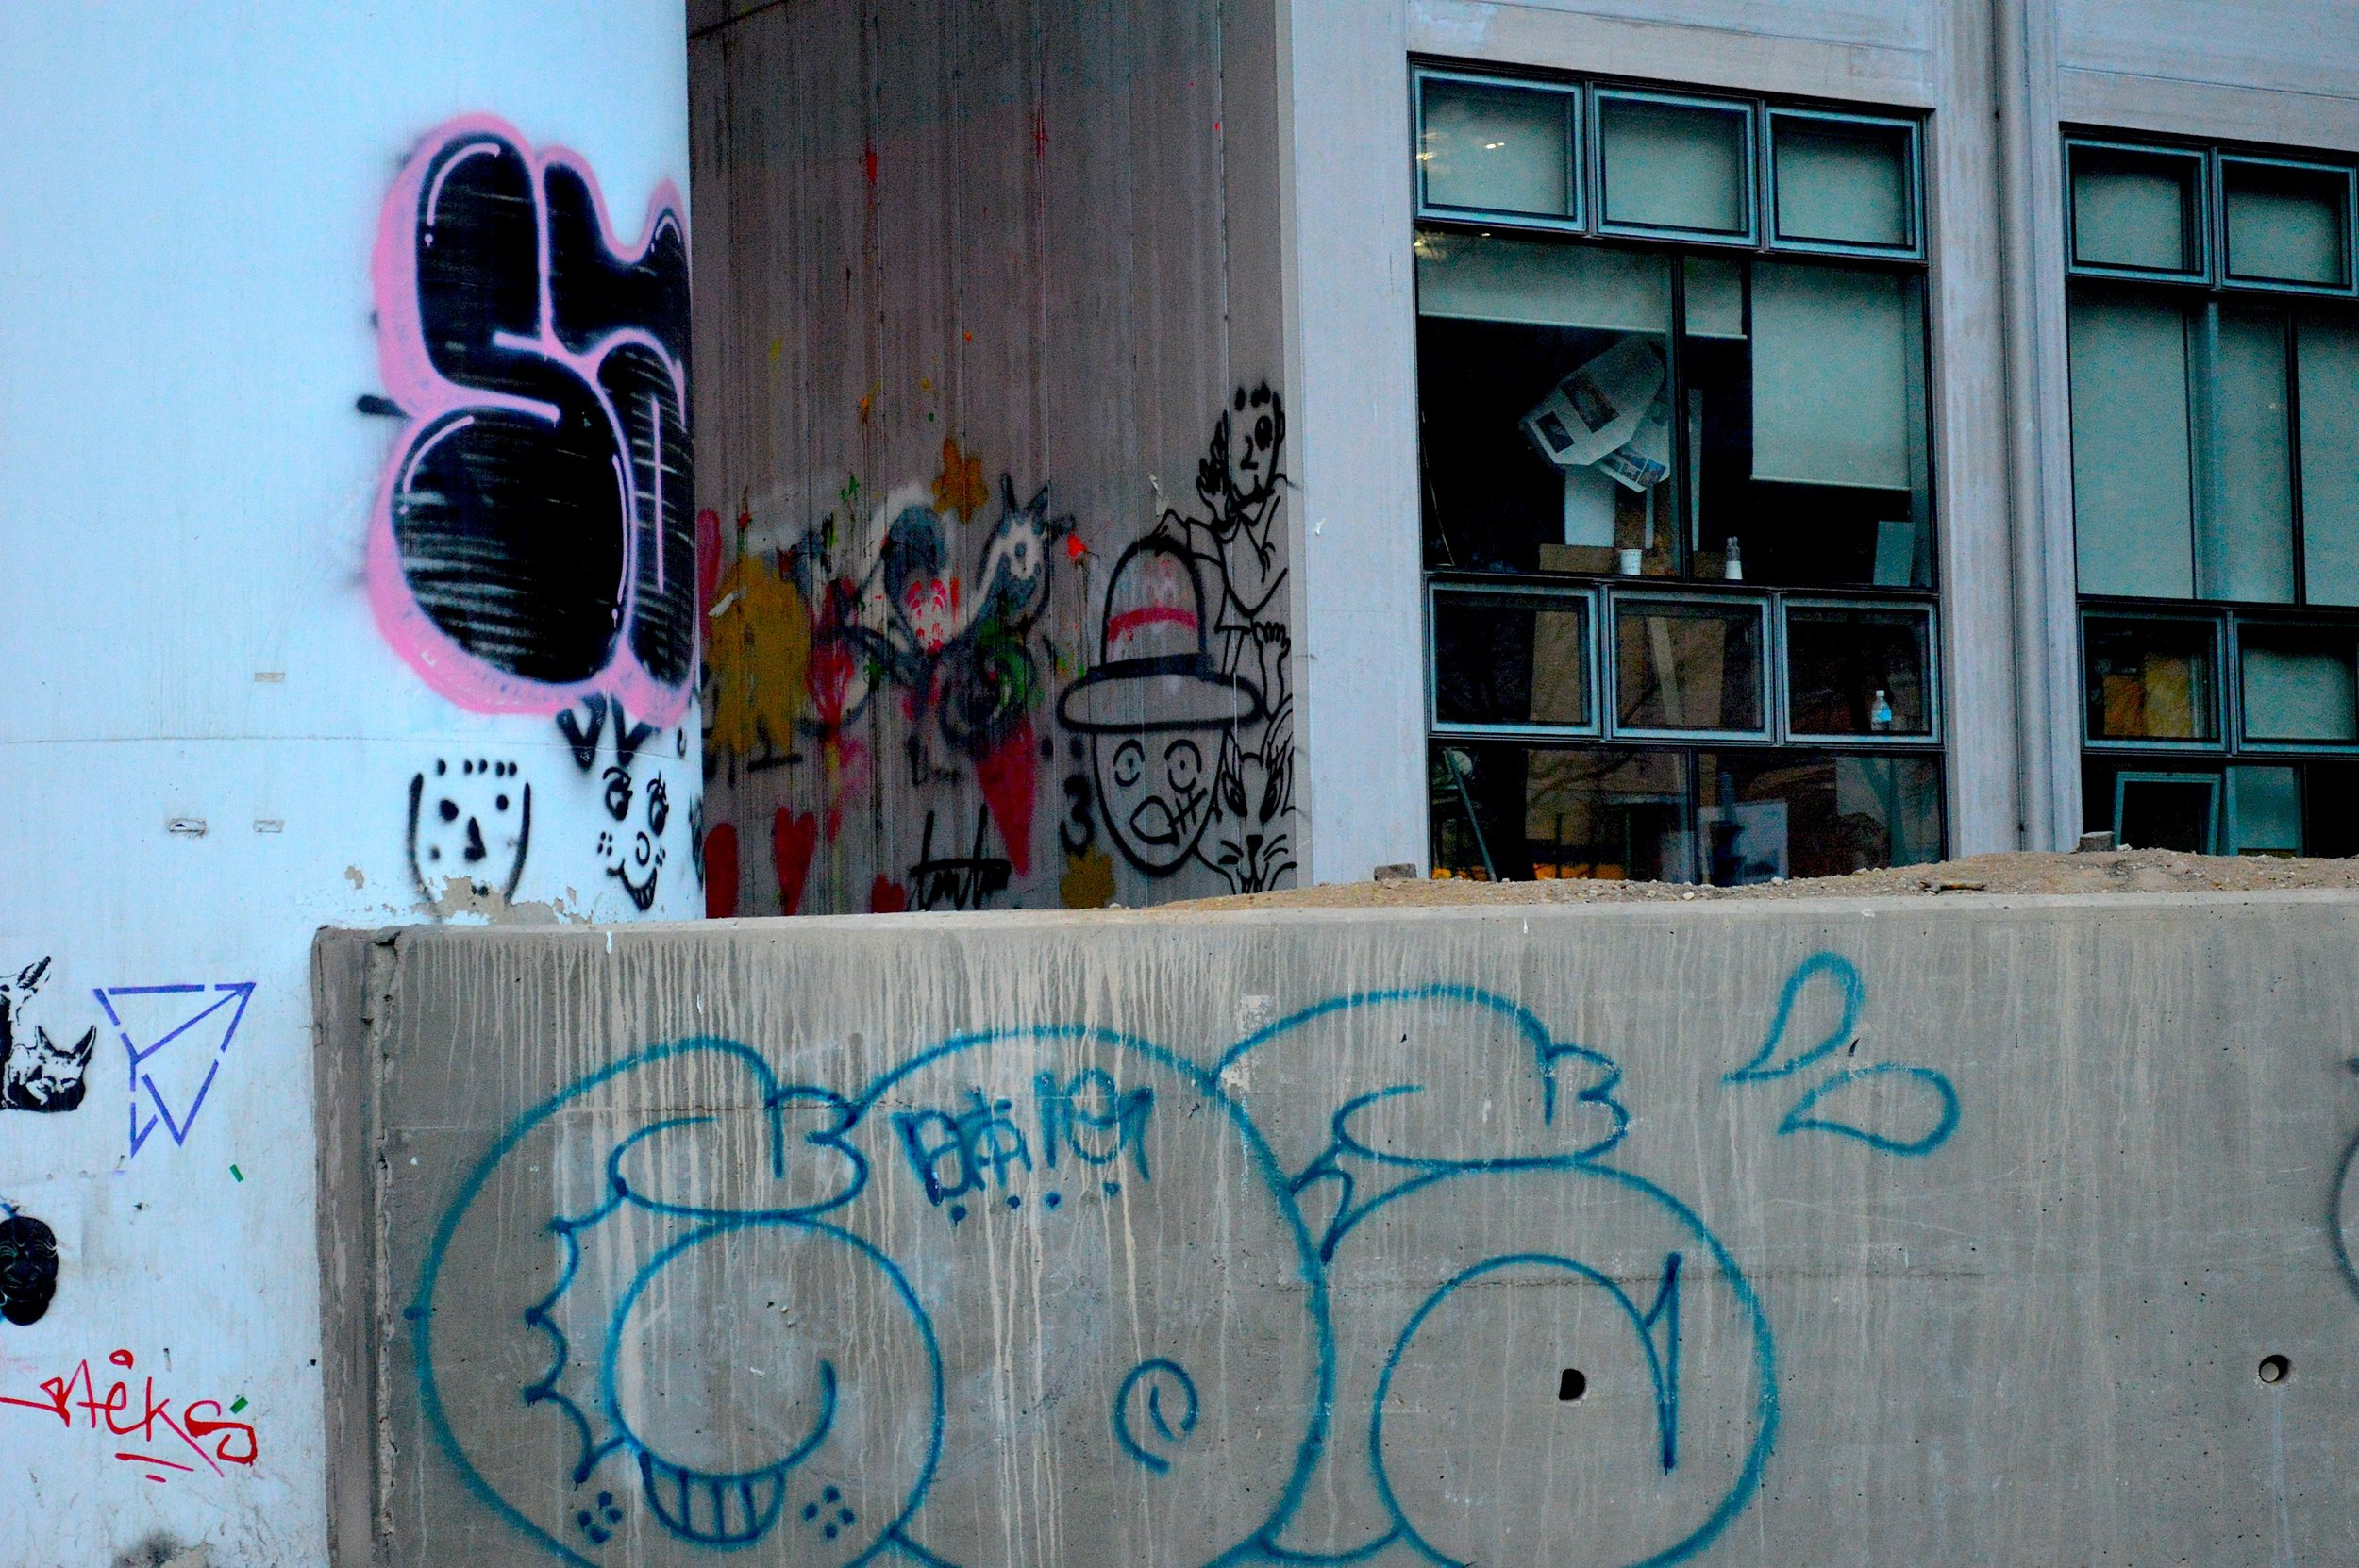 Graffiti in Anyang, South Korea.